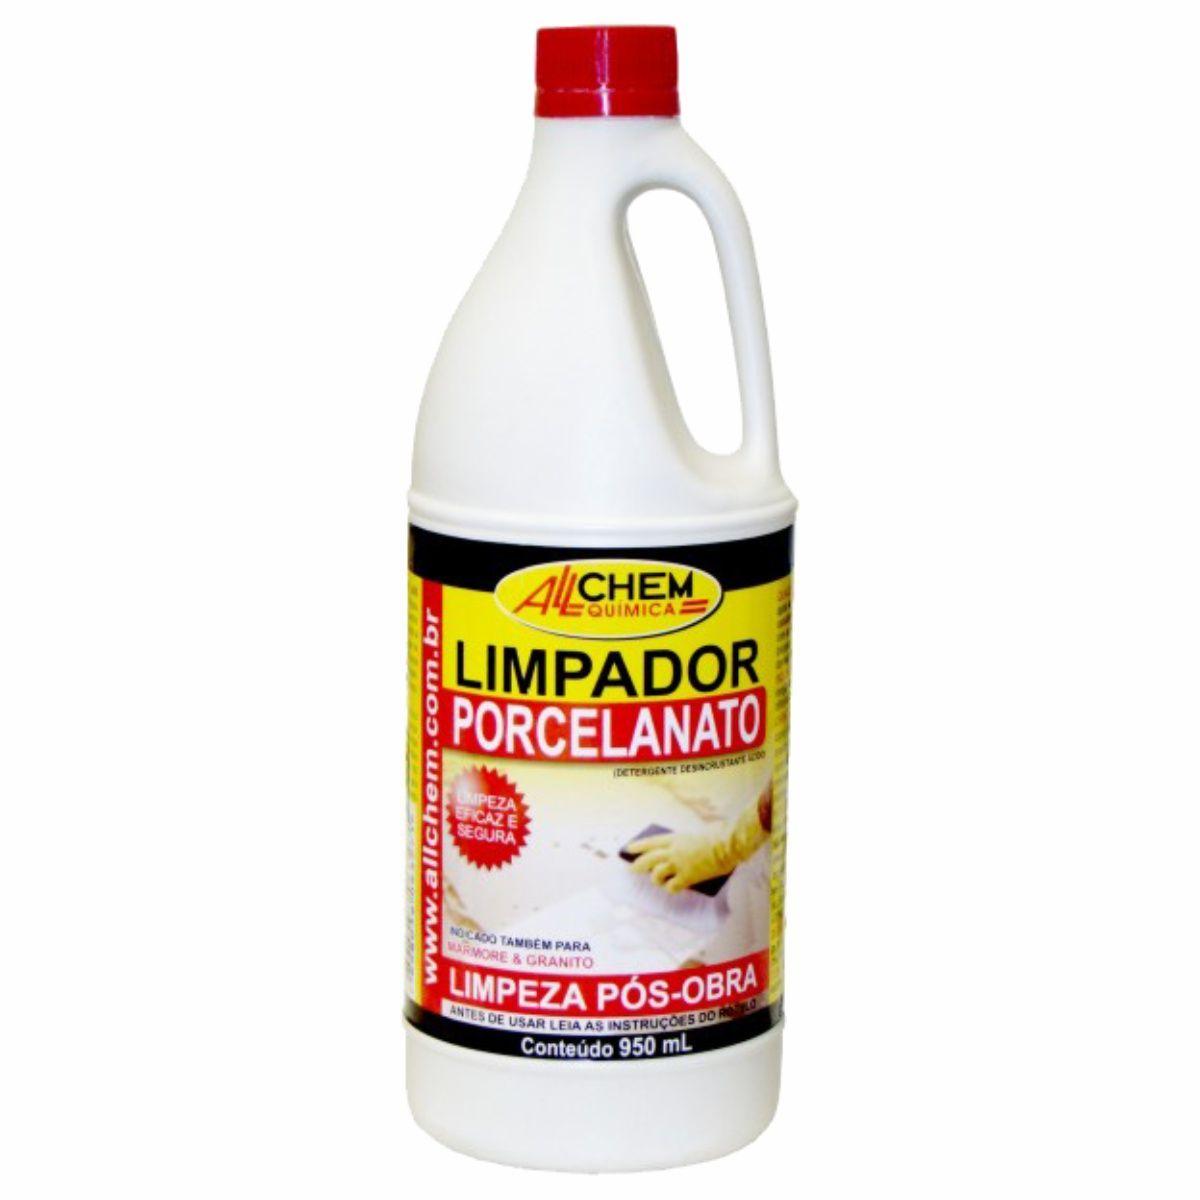 Limpador Porcelanato (Pós-obra) 12x950 mL